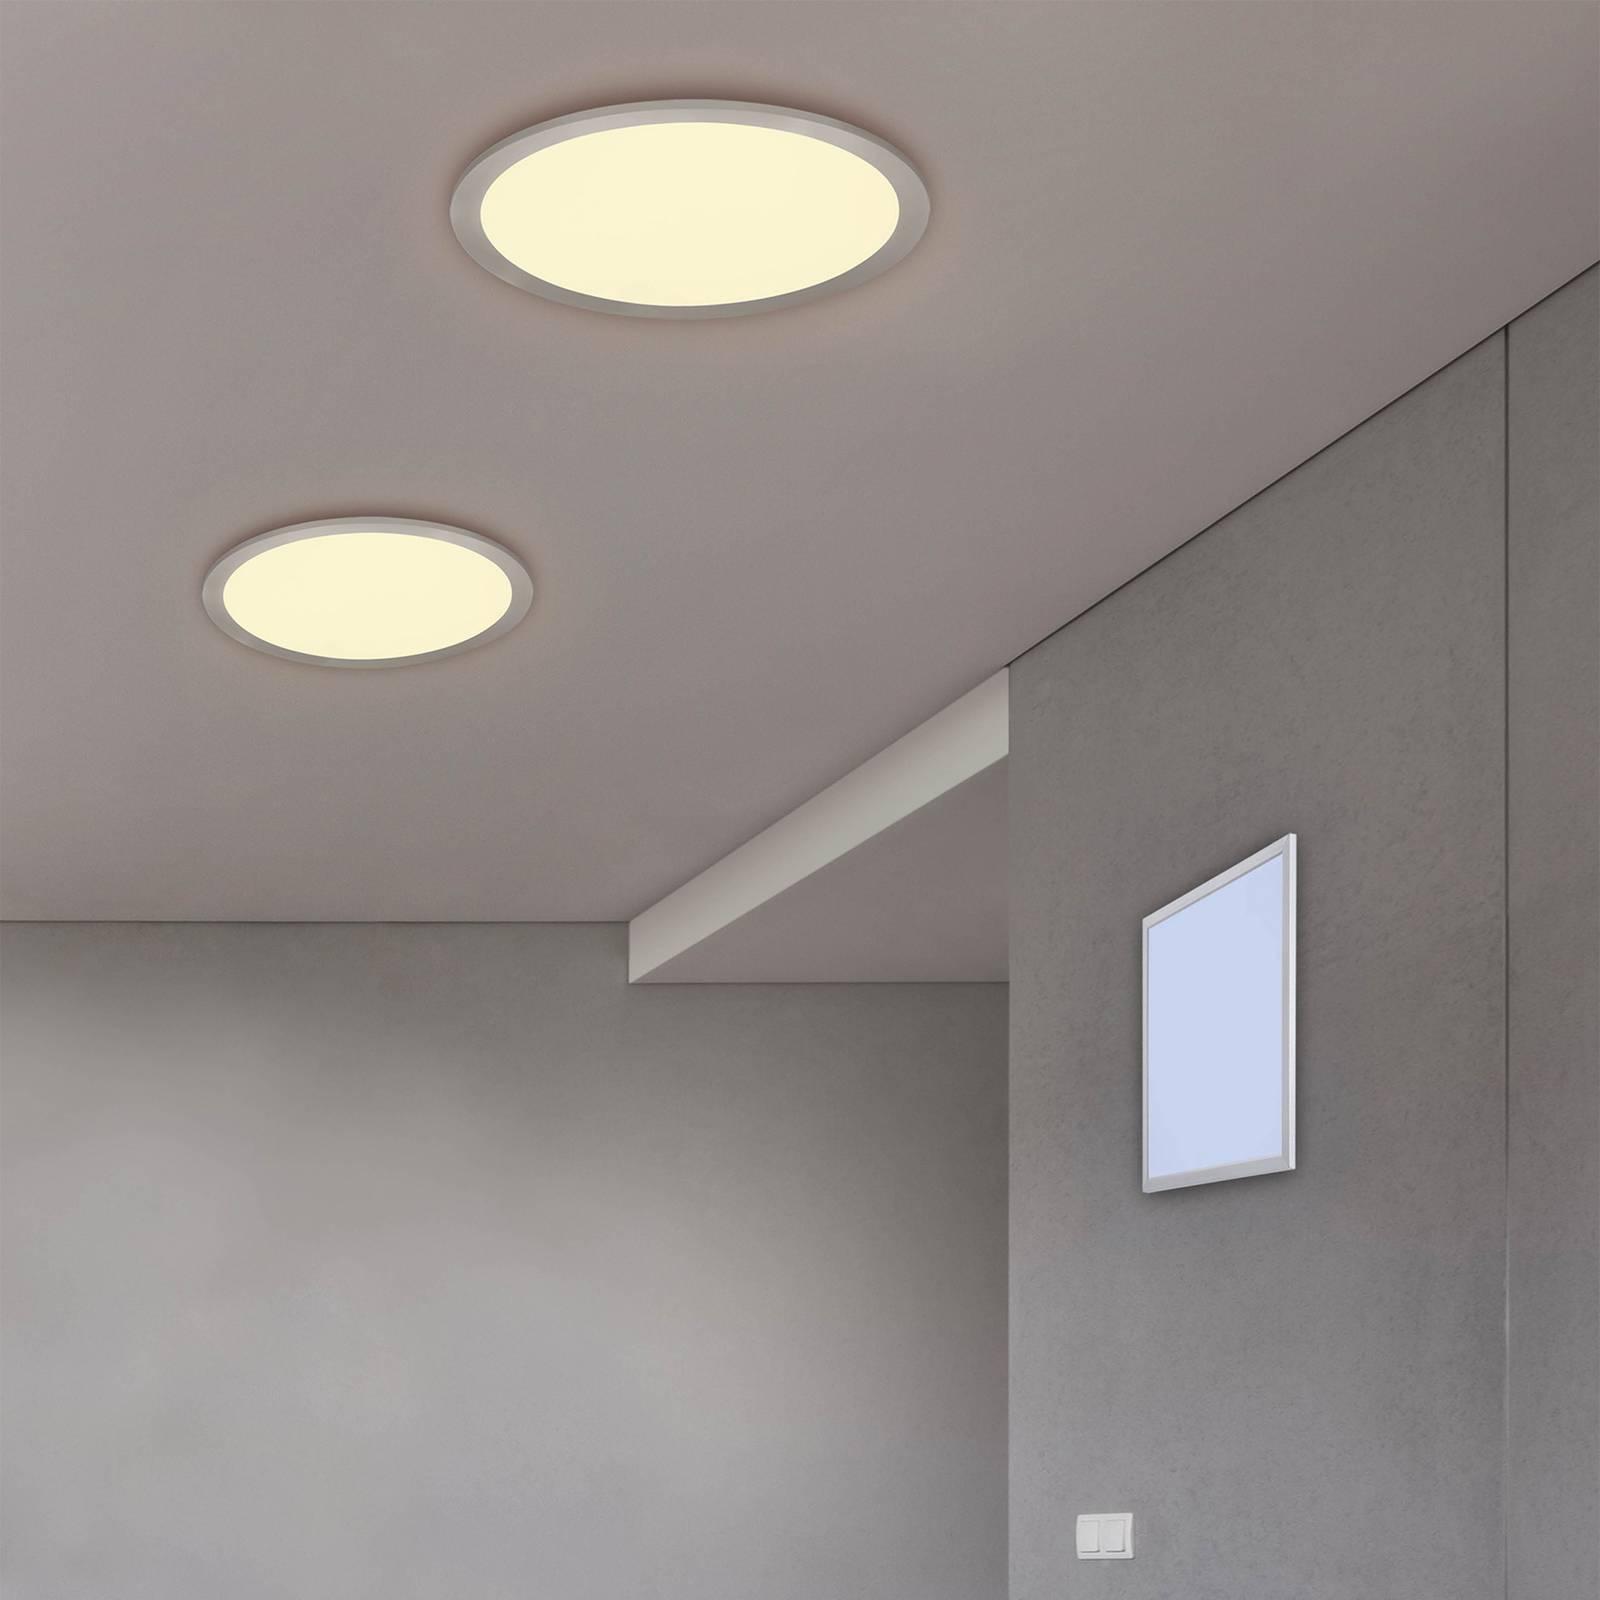 LED-kattovalaisin Alima, CCT, WiZ, Ø 30 cm